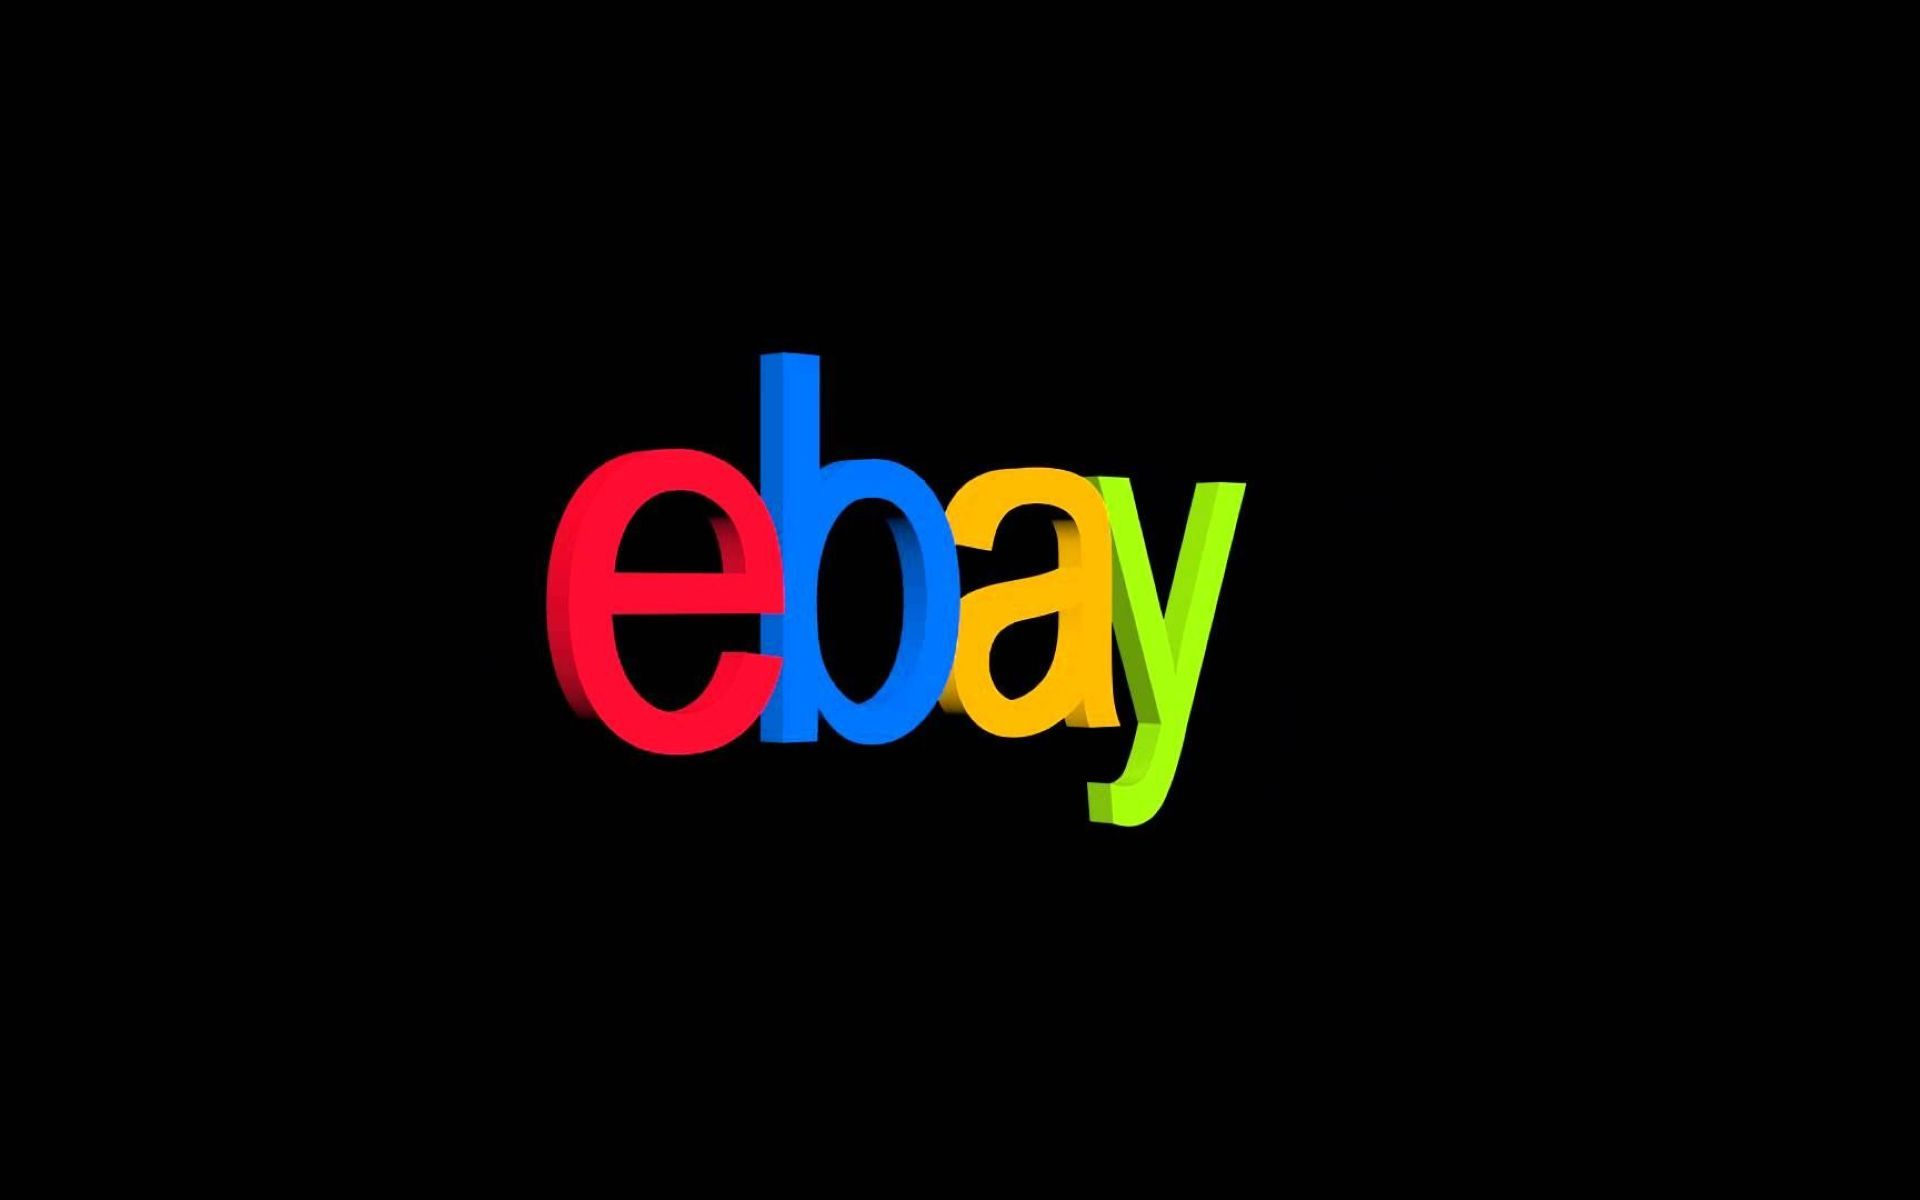 Ebay Wallpapers Hd 1 Logo Wallpaper Hd Picture Logo Logos